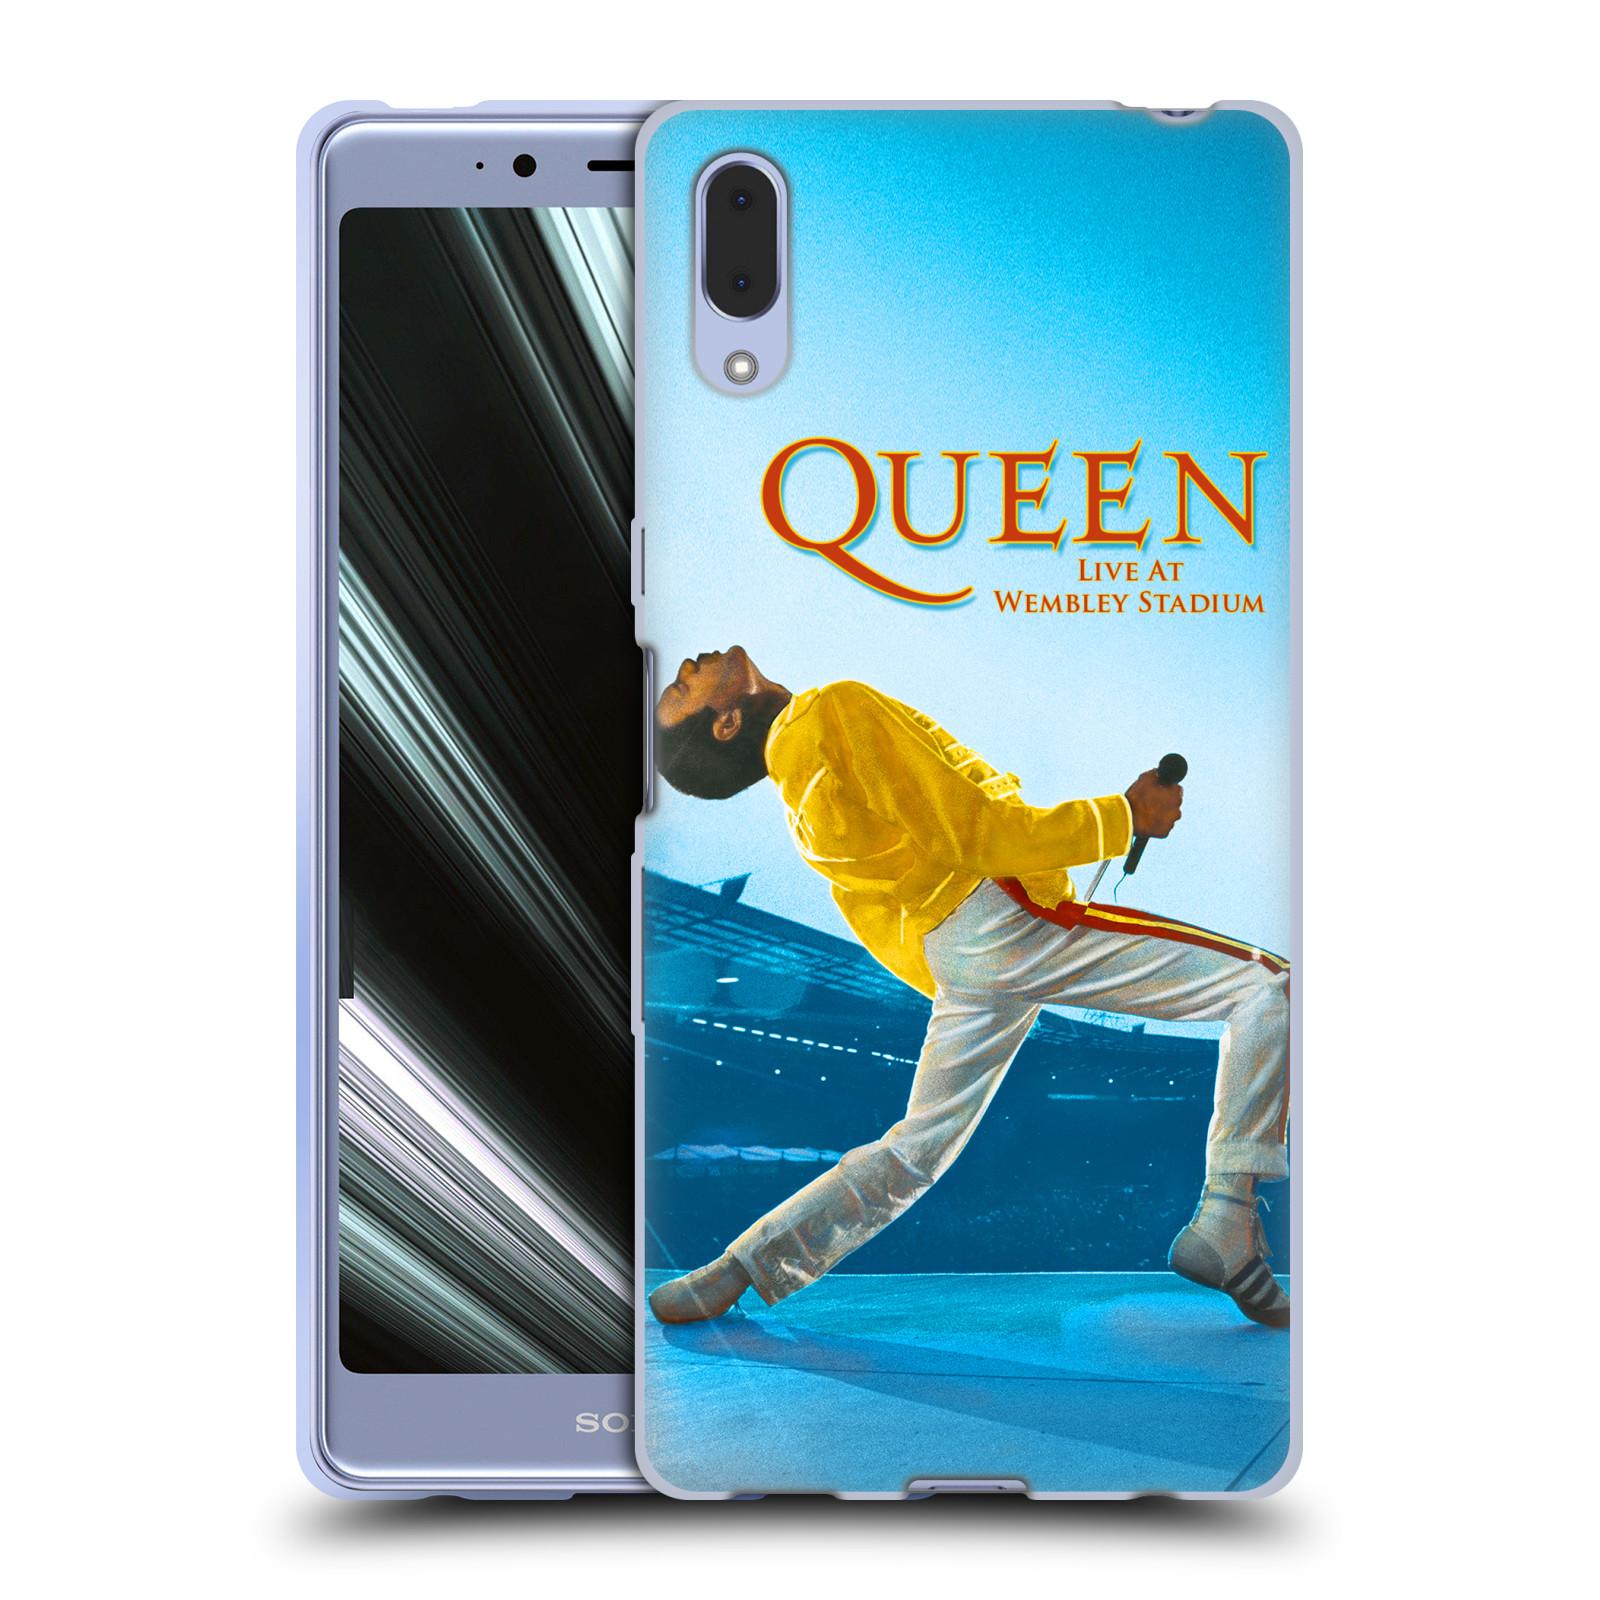 Silikonové pouzdro na mobil Sony Xperia L3 - Head Case - Queen - Freddie Mercury